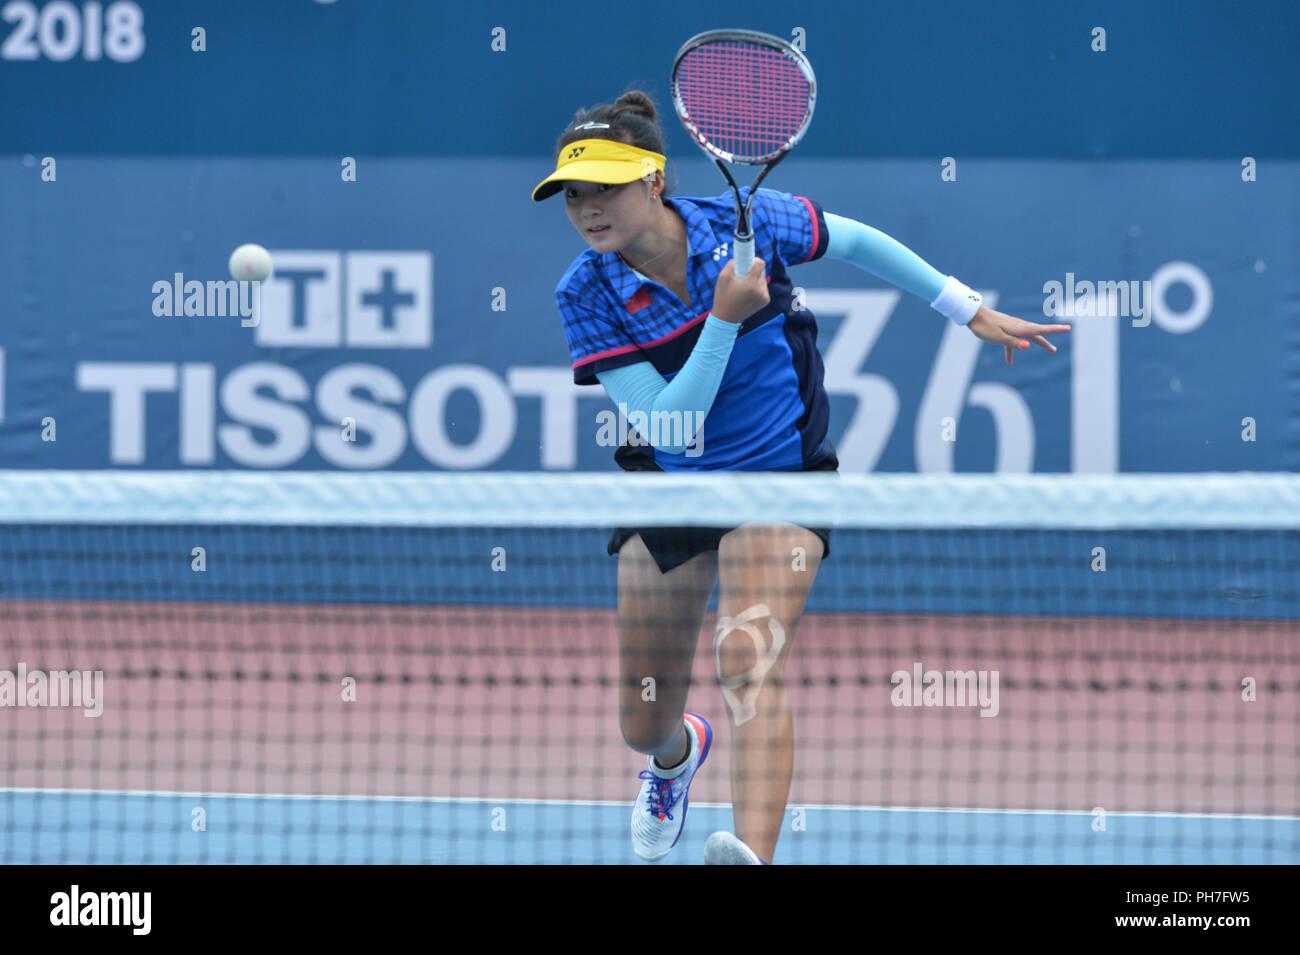 Palembang 31st Aug 2018 Yu Yuanyi Of China Competes During Soft